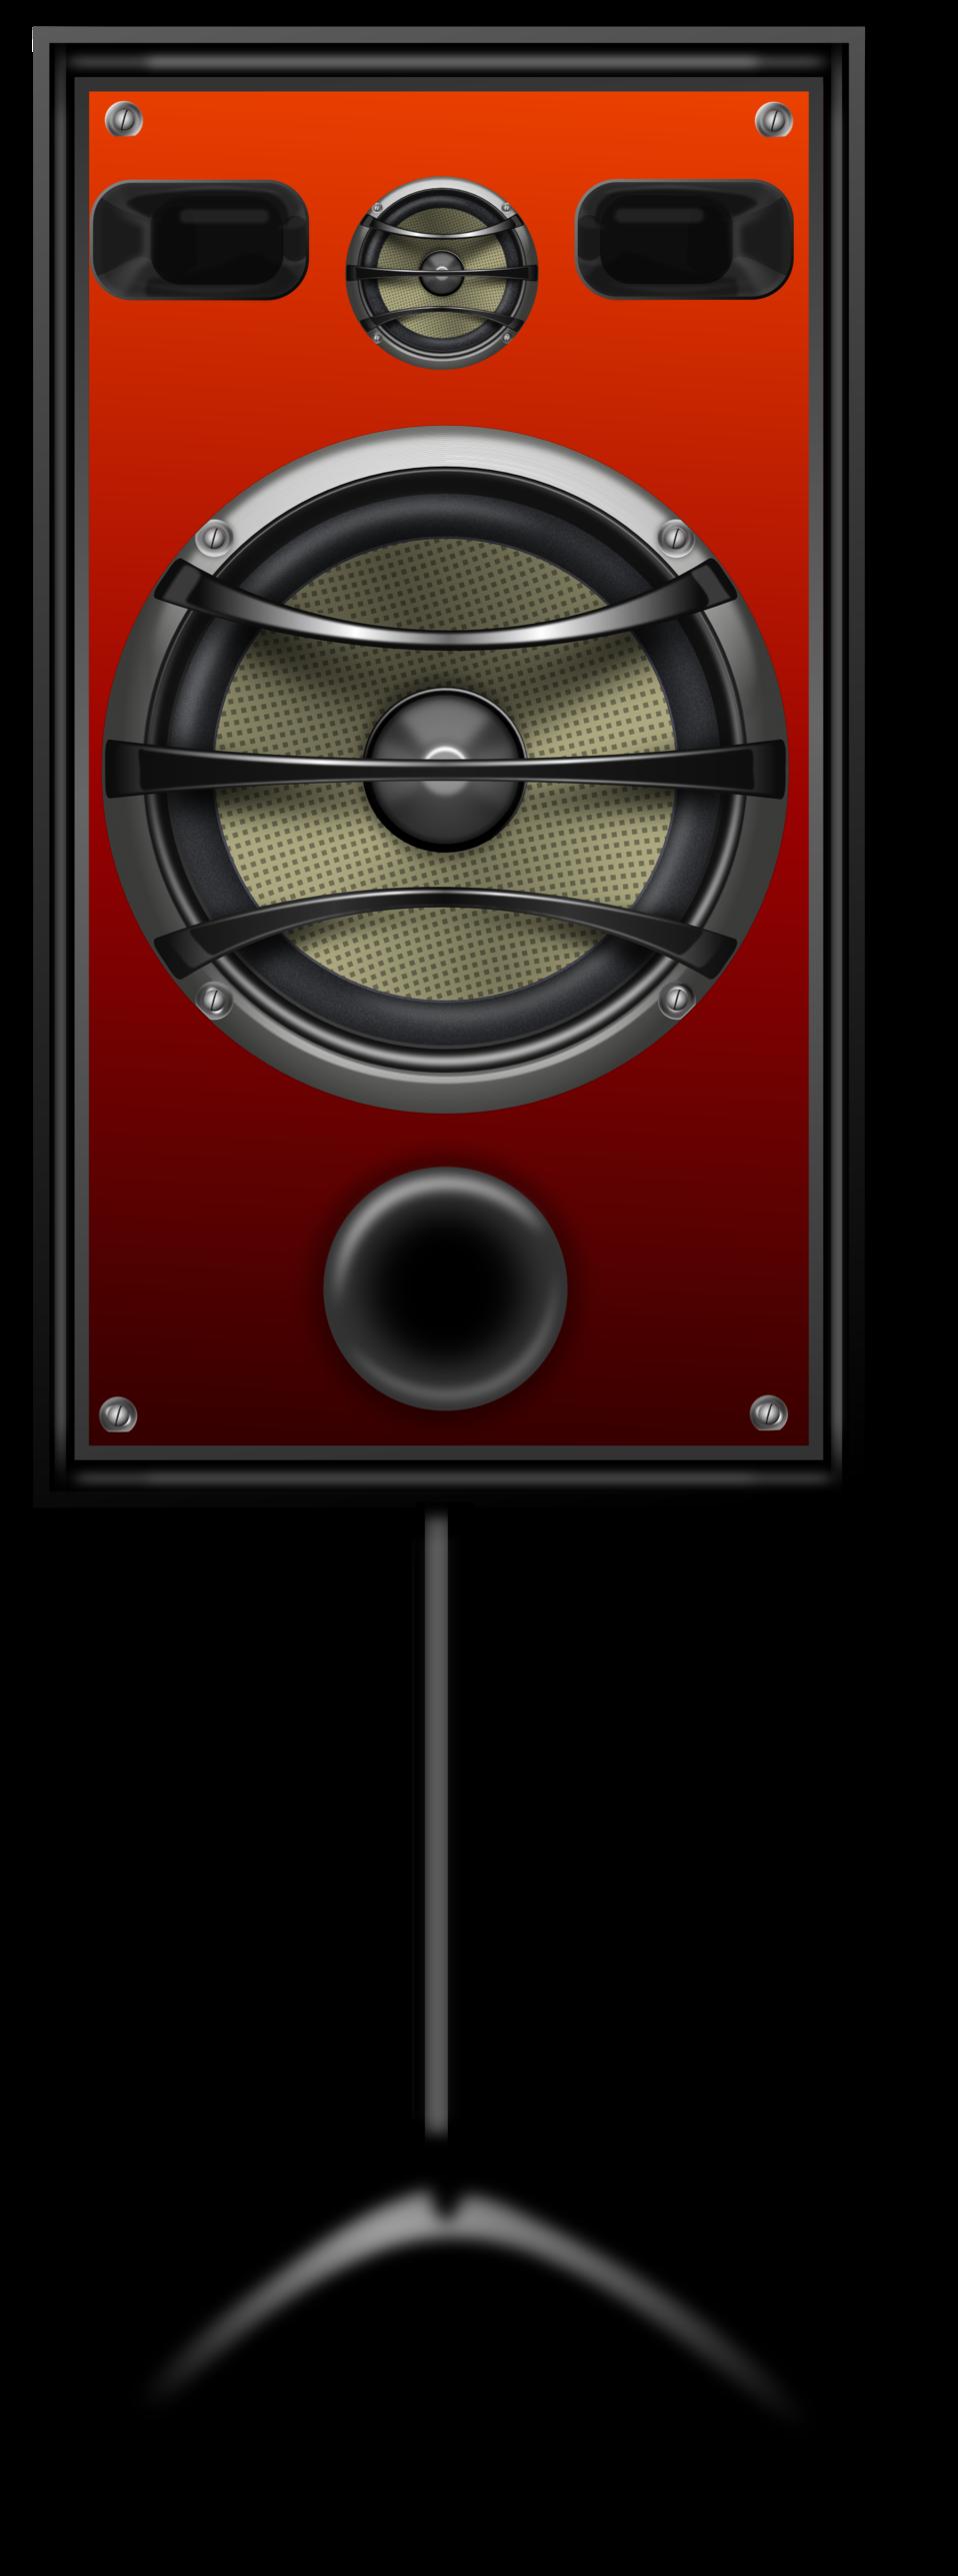 Studio Speaker 2 Orange Grill